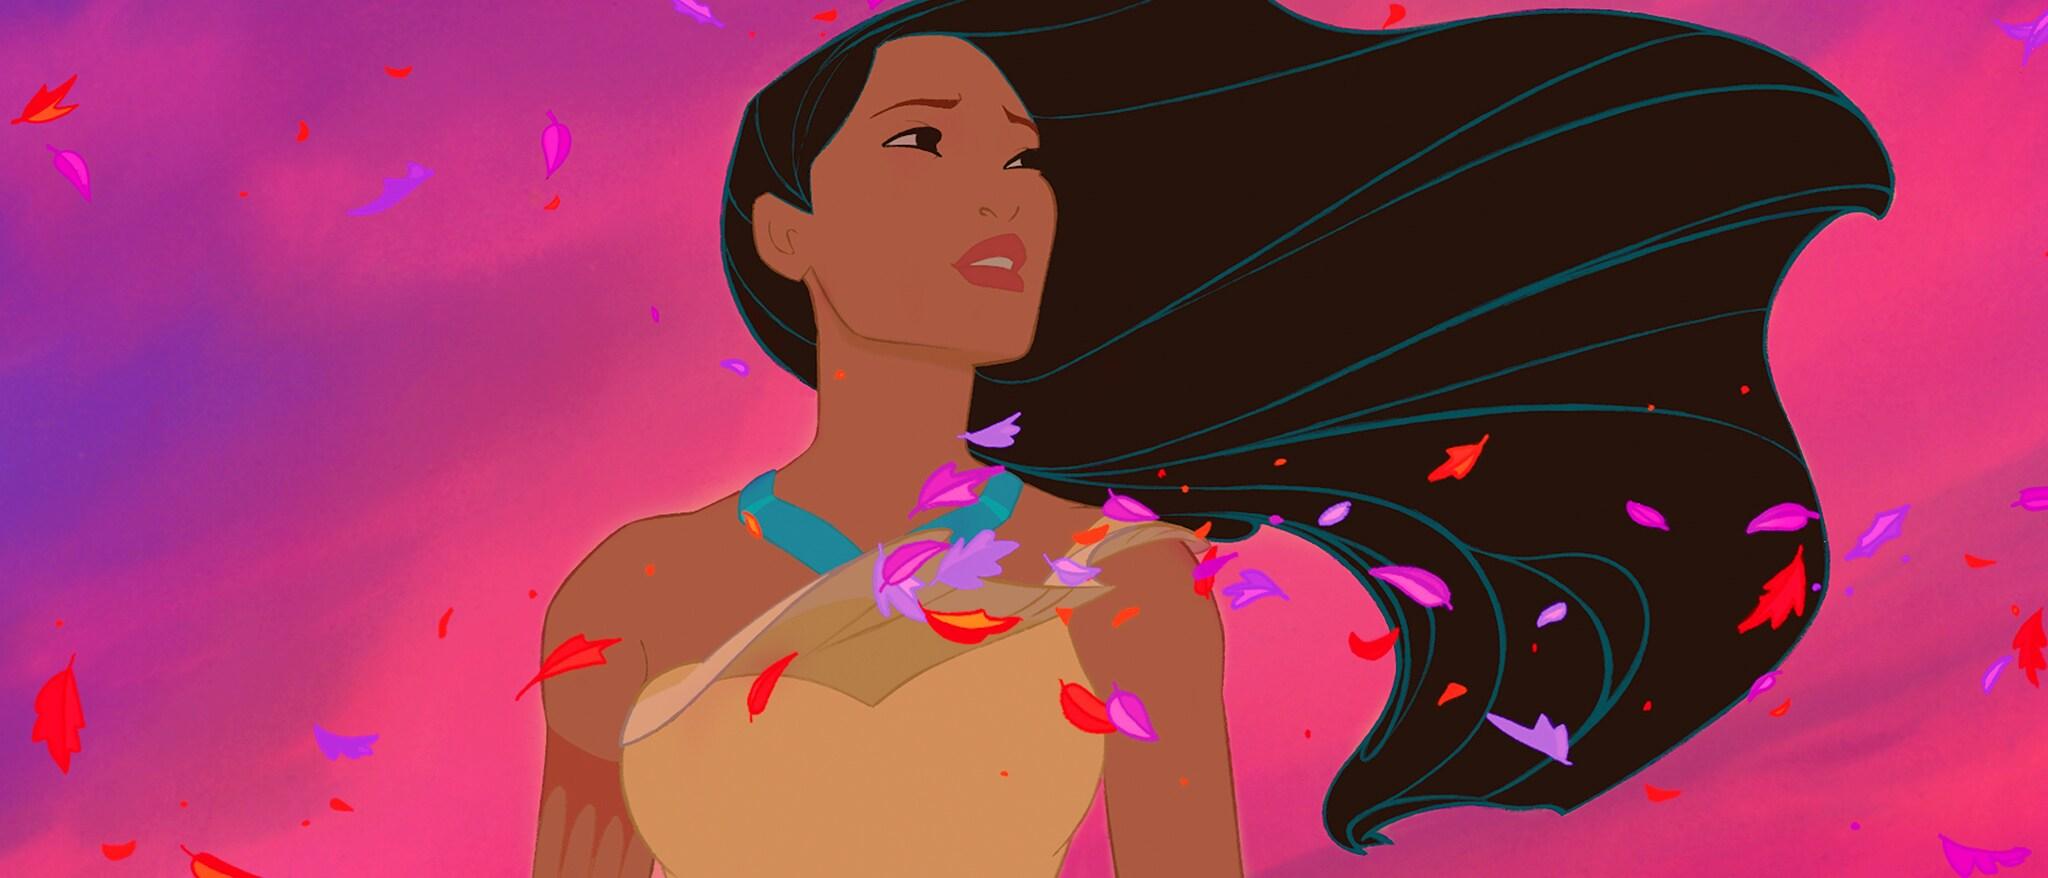 Pocahontas Hero - the one